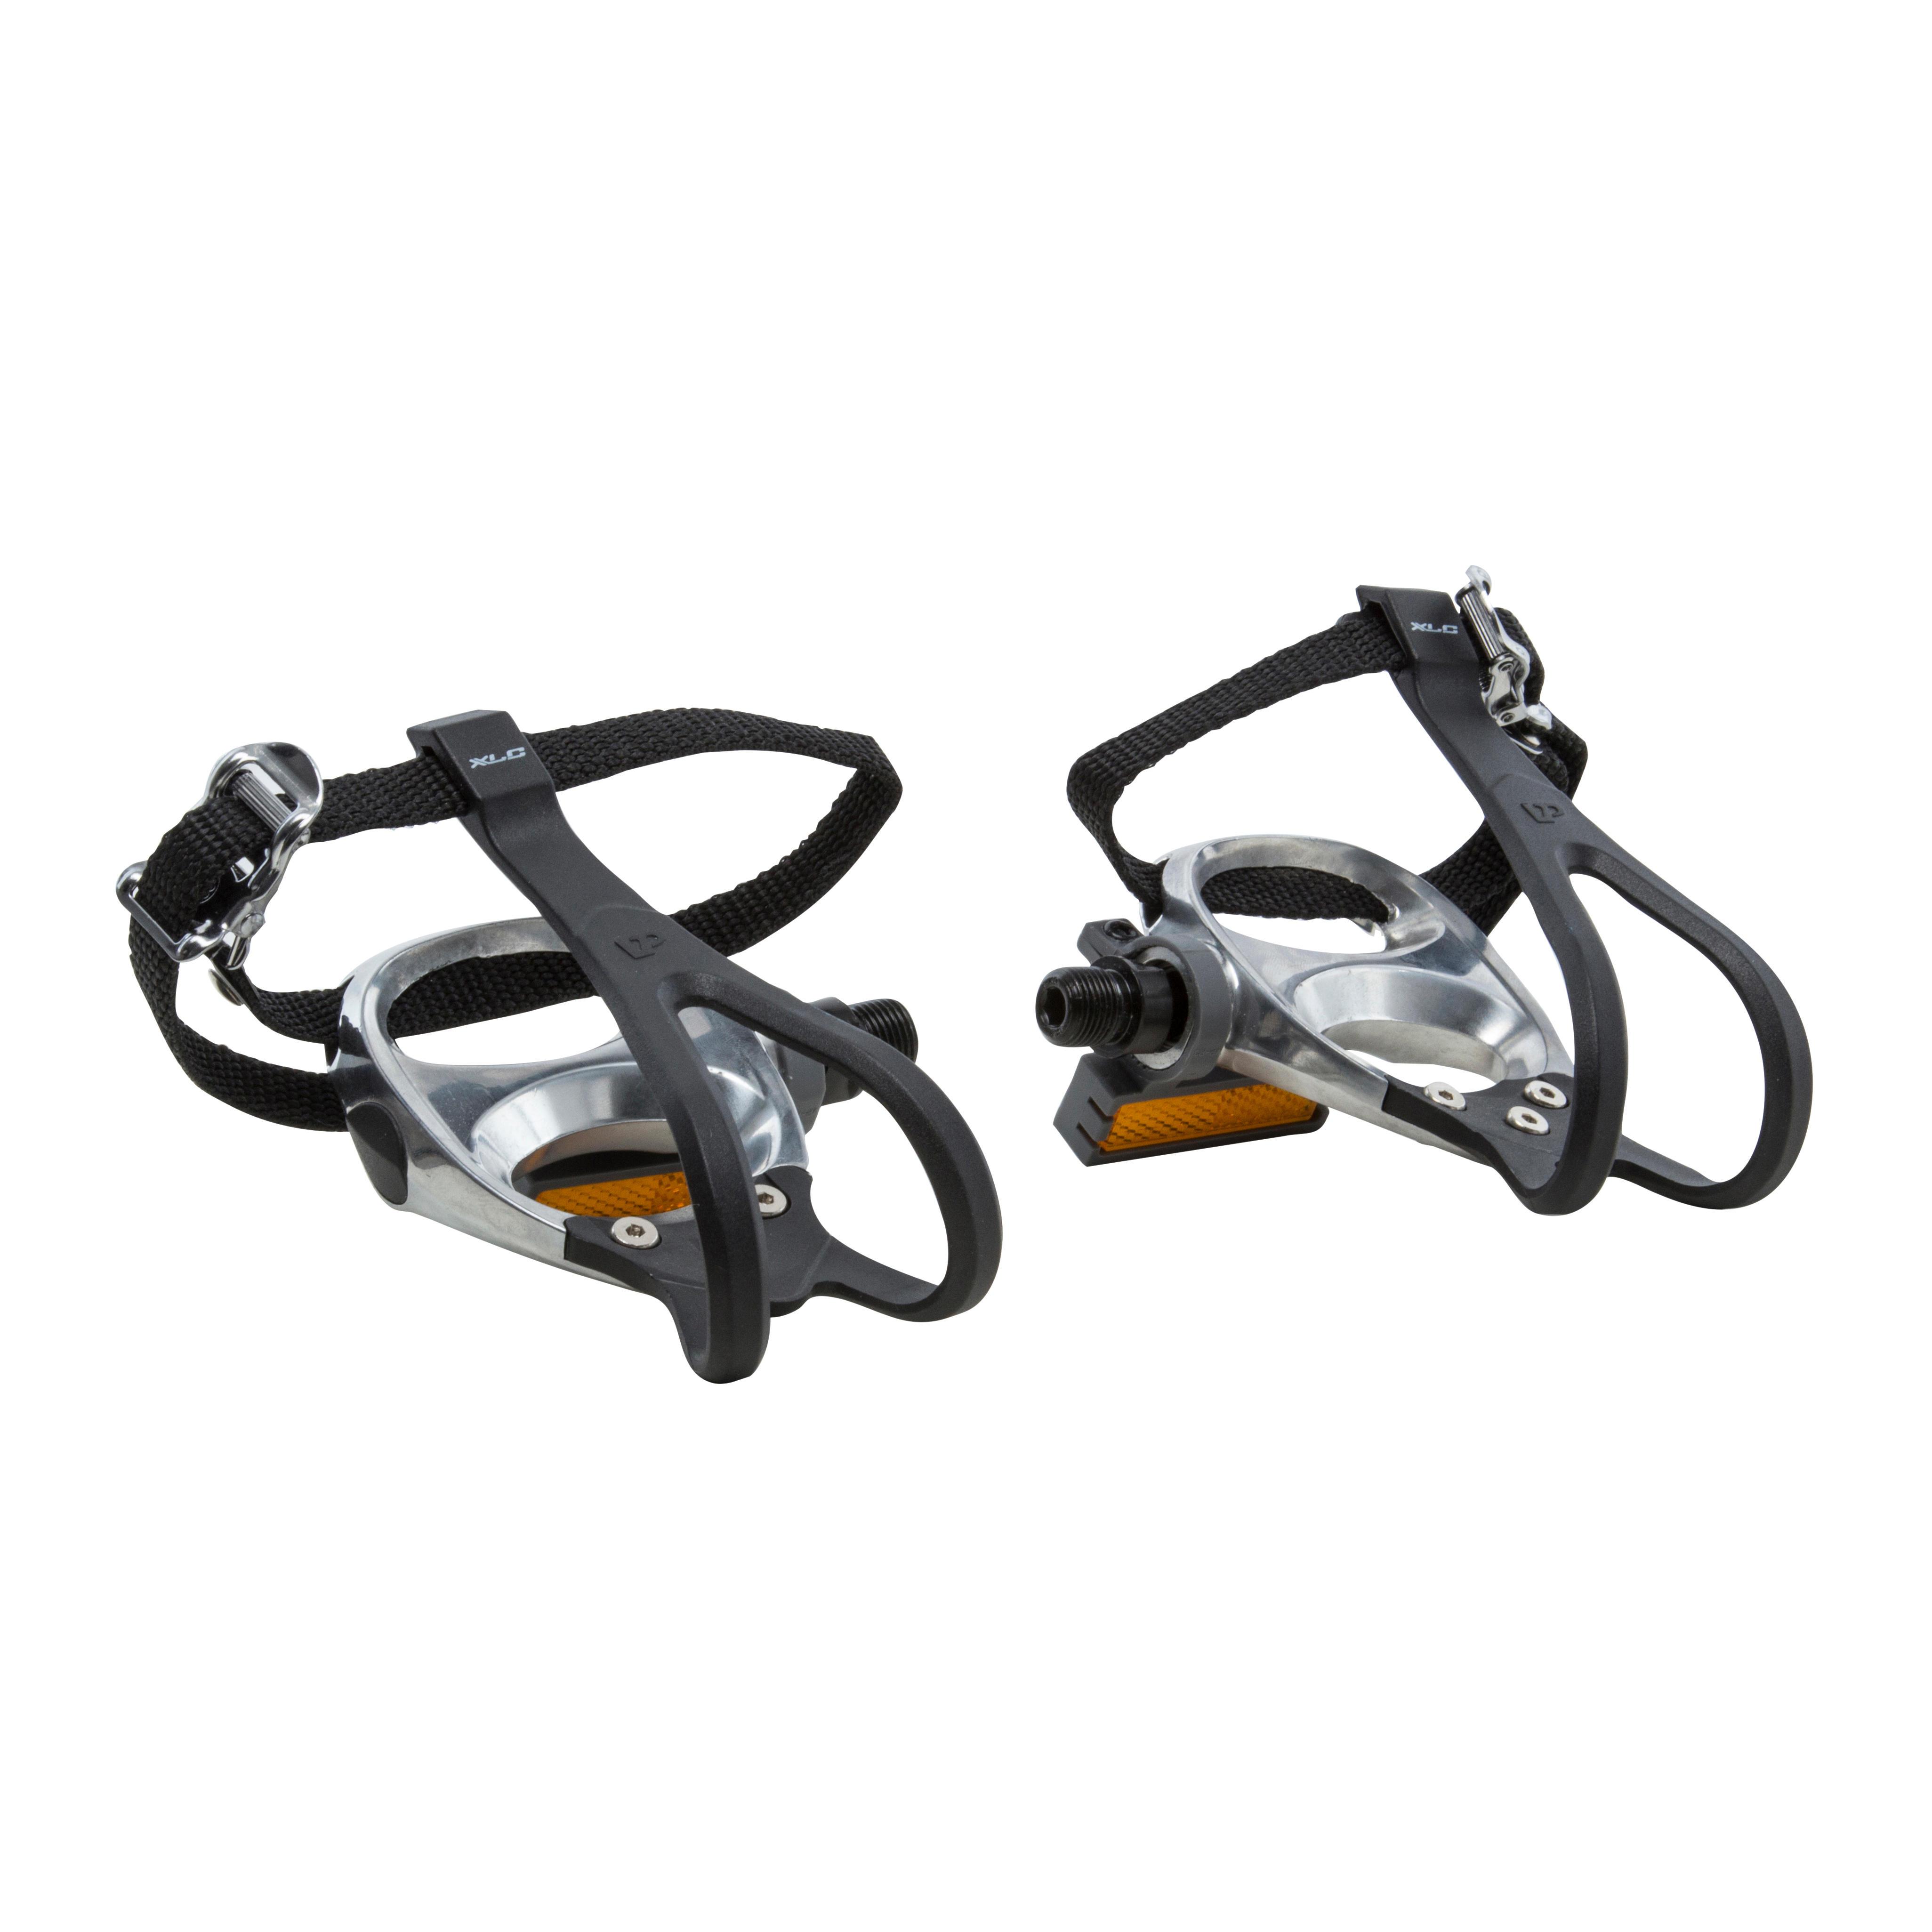 B'twin Racepedalen 100 aluminium + schoenplaatjes en voetriempjes